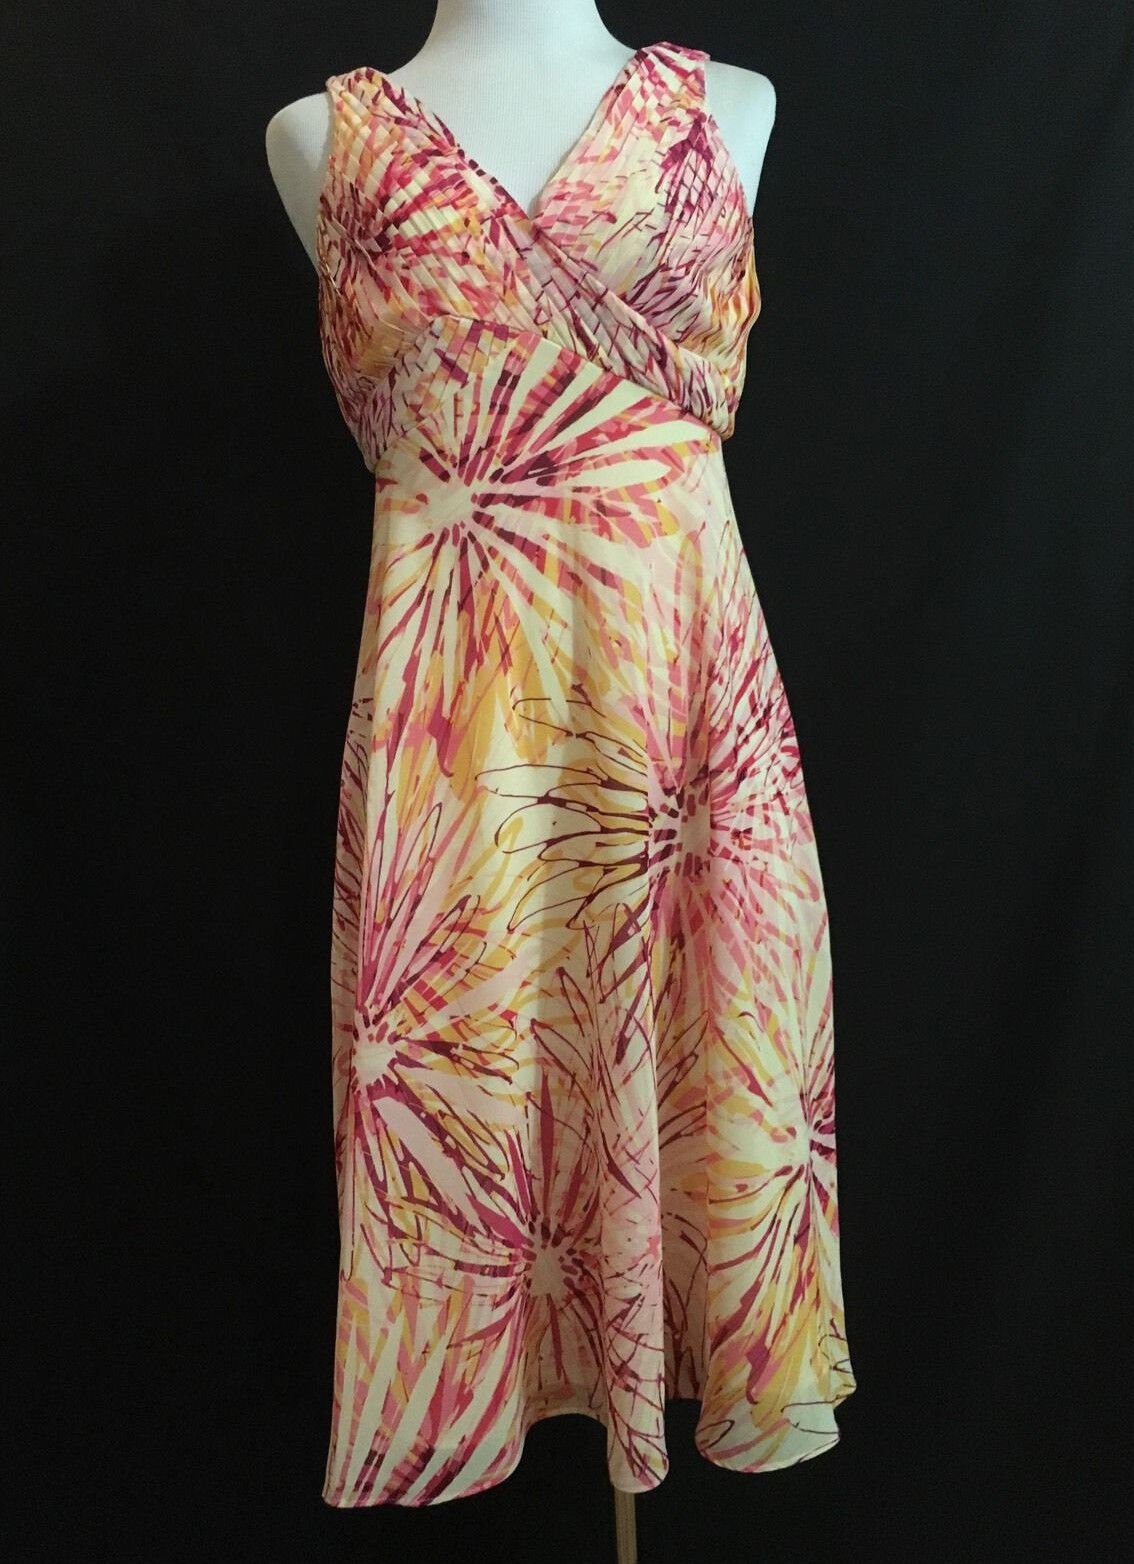 ..ADRIANNA PAPELL women's orange yellow Sunburst Sleeveless Dress Sz 4